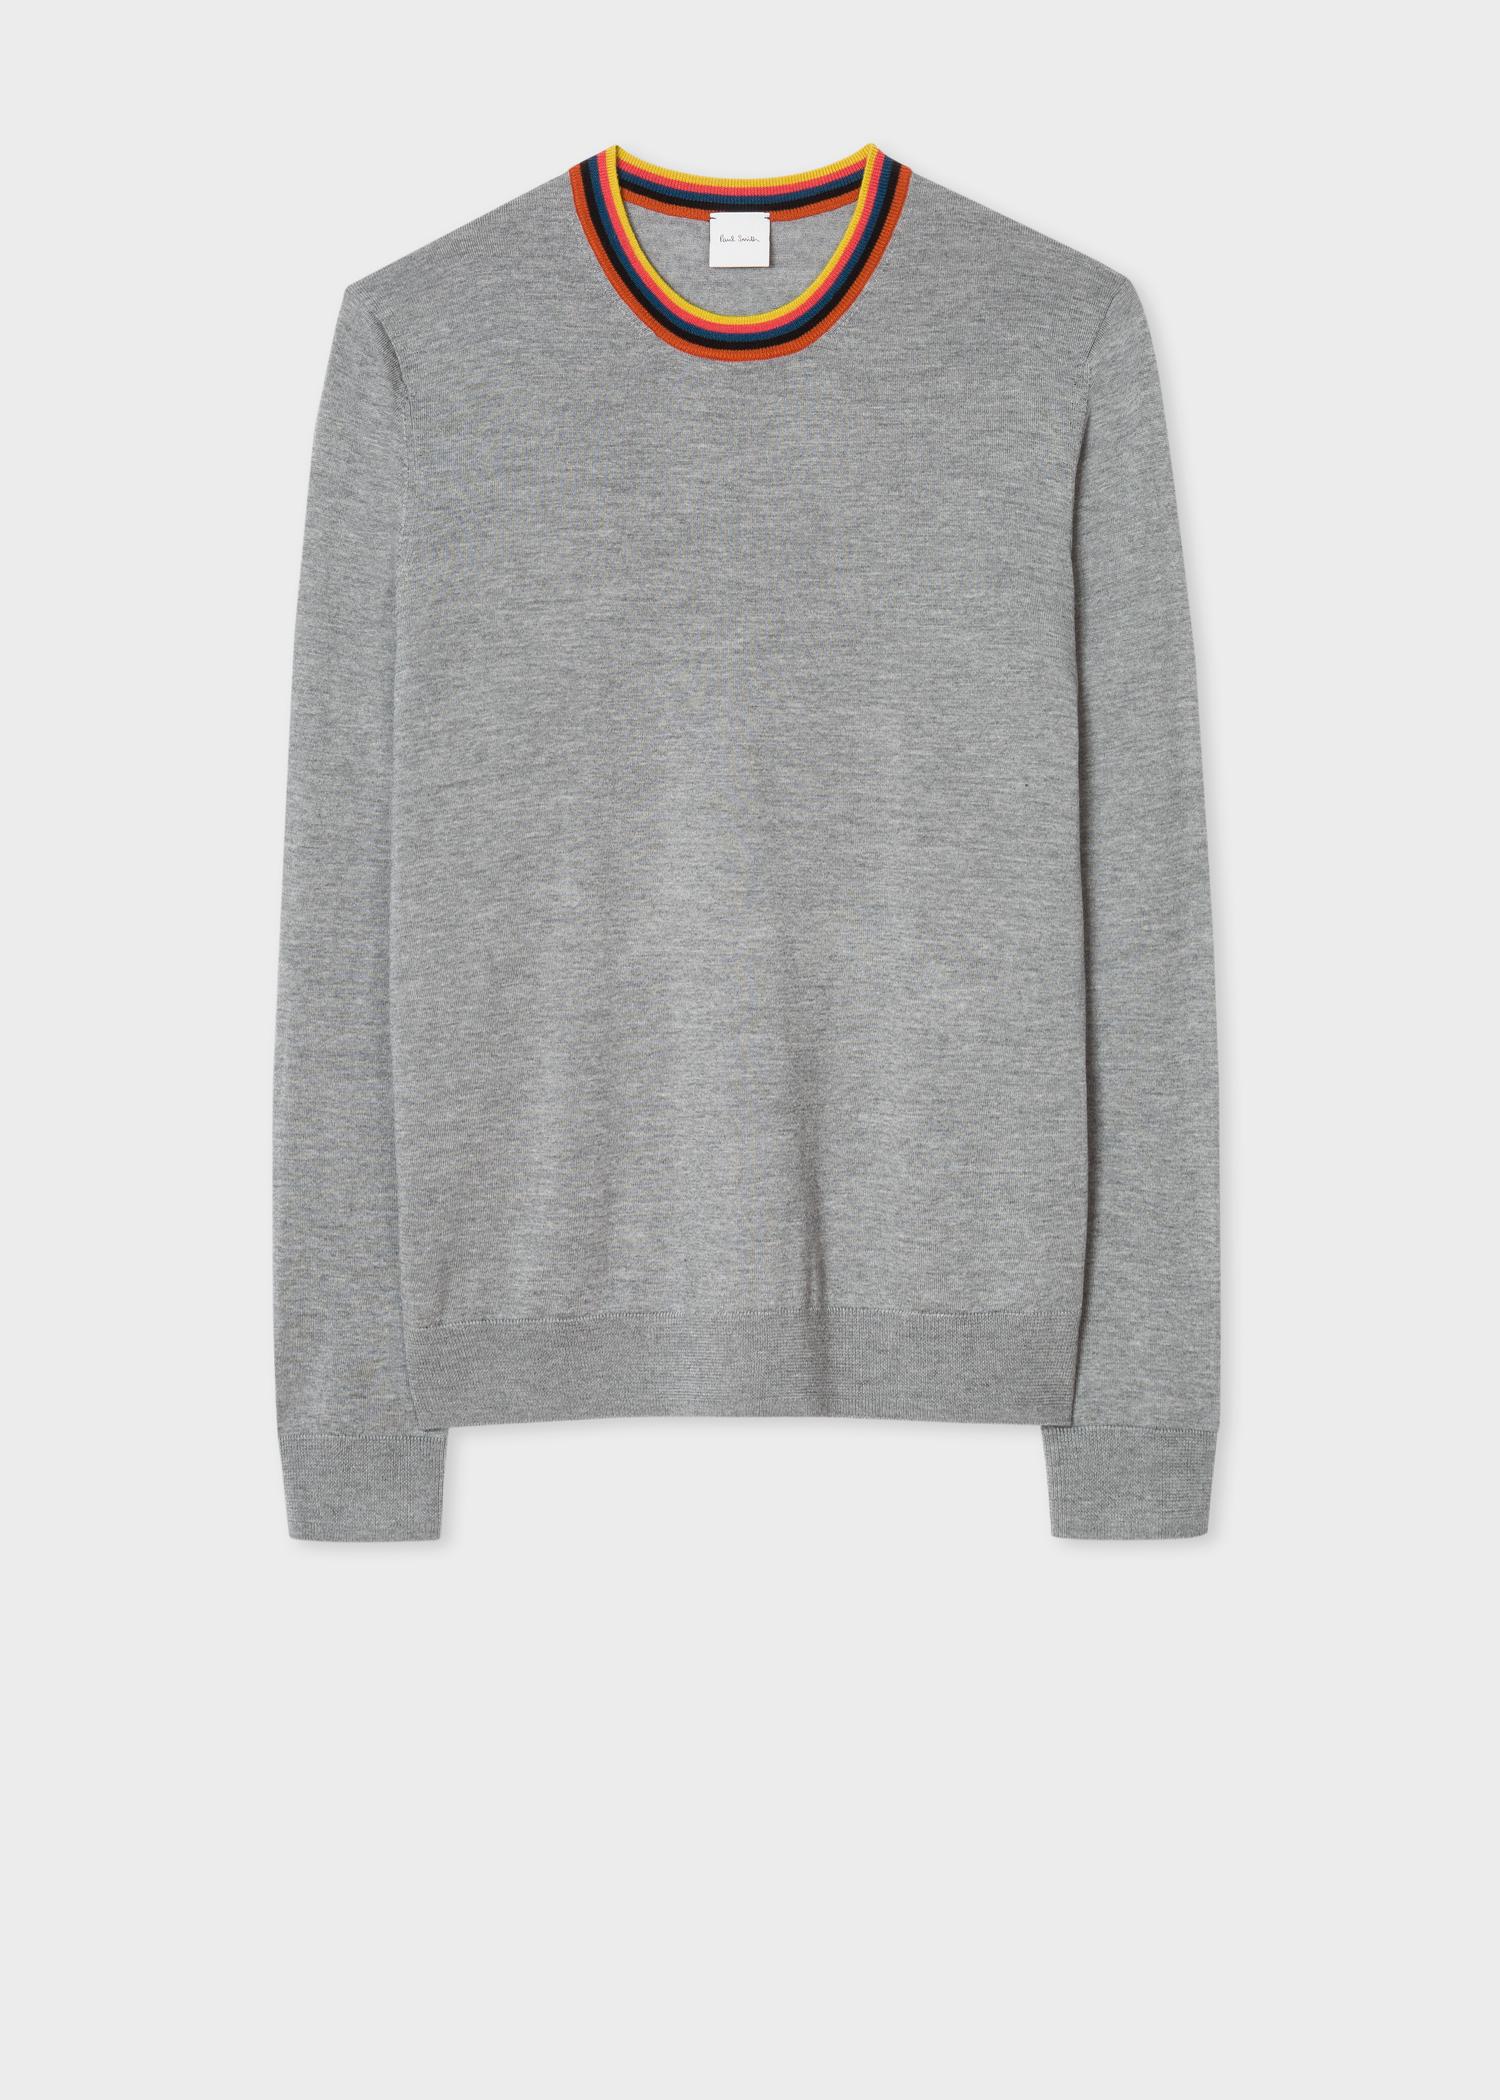 8756f8fbb1497a Front View - Men's Light Grey Merino Wool Sweater With 'Artist Stripe'  Collar Paul